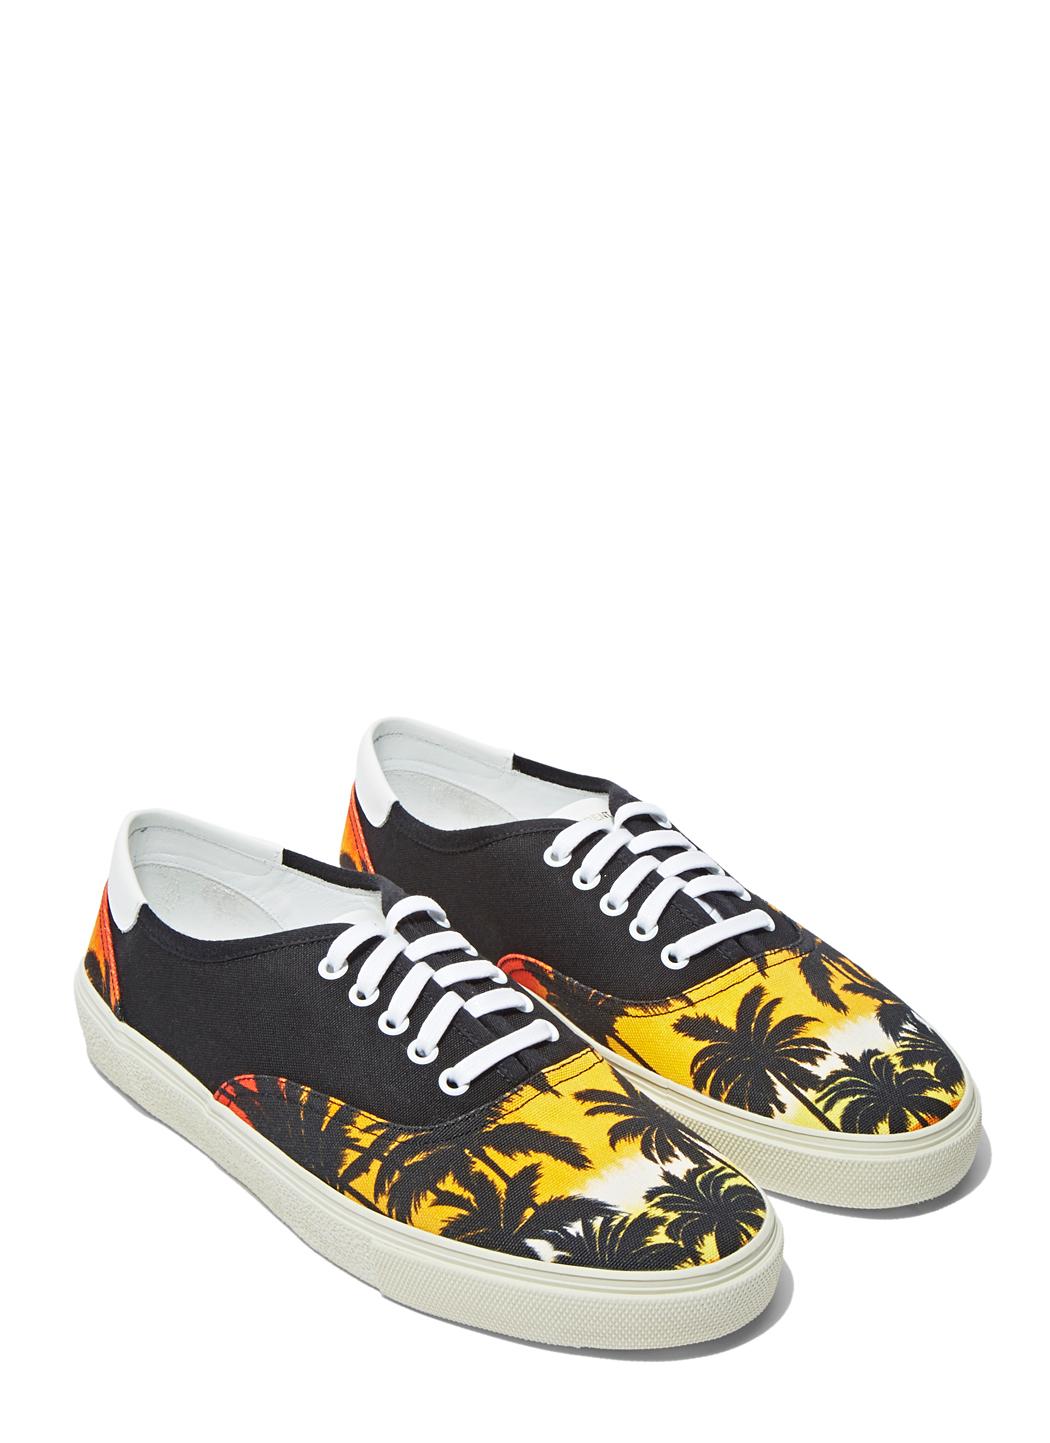 Saint Laurent Skate Shoes Black With Gold